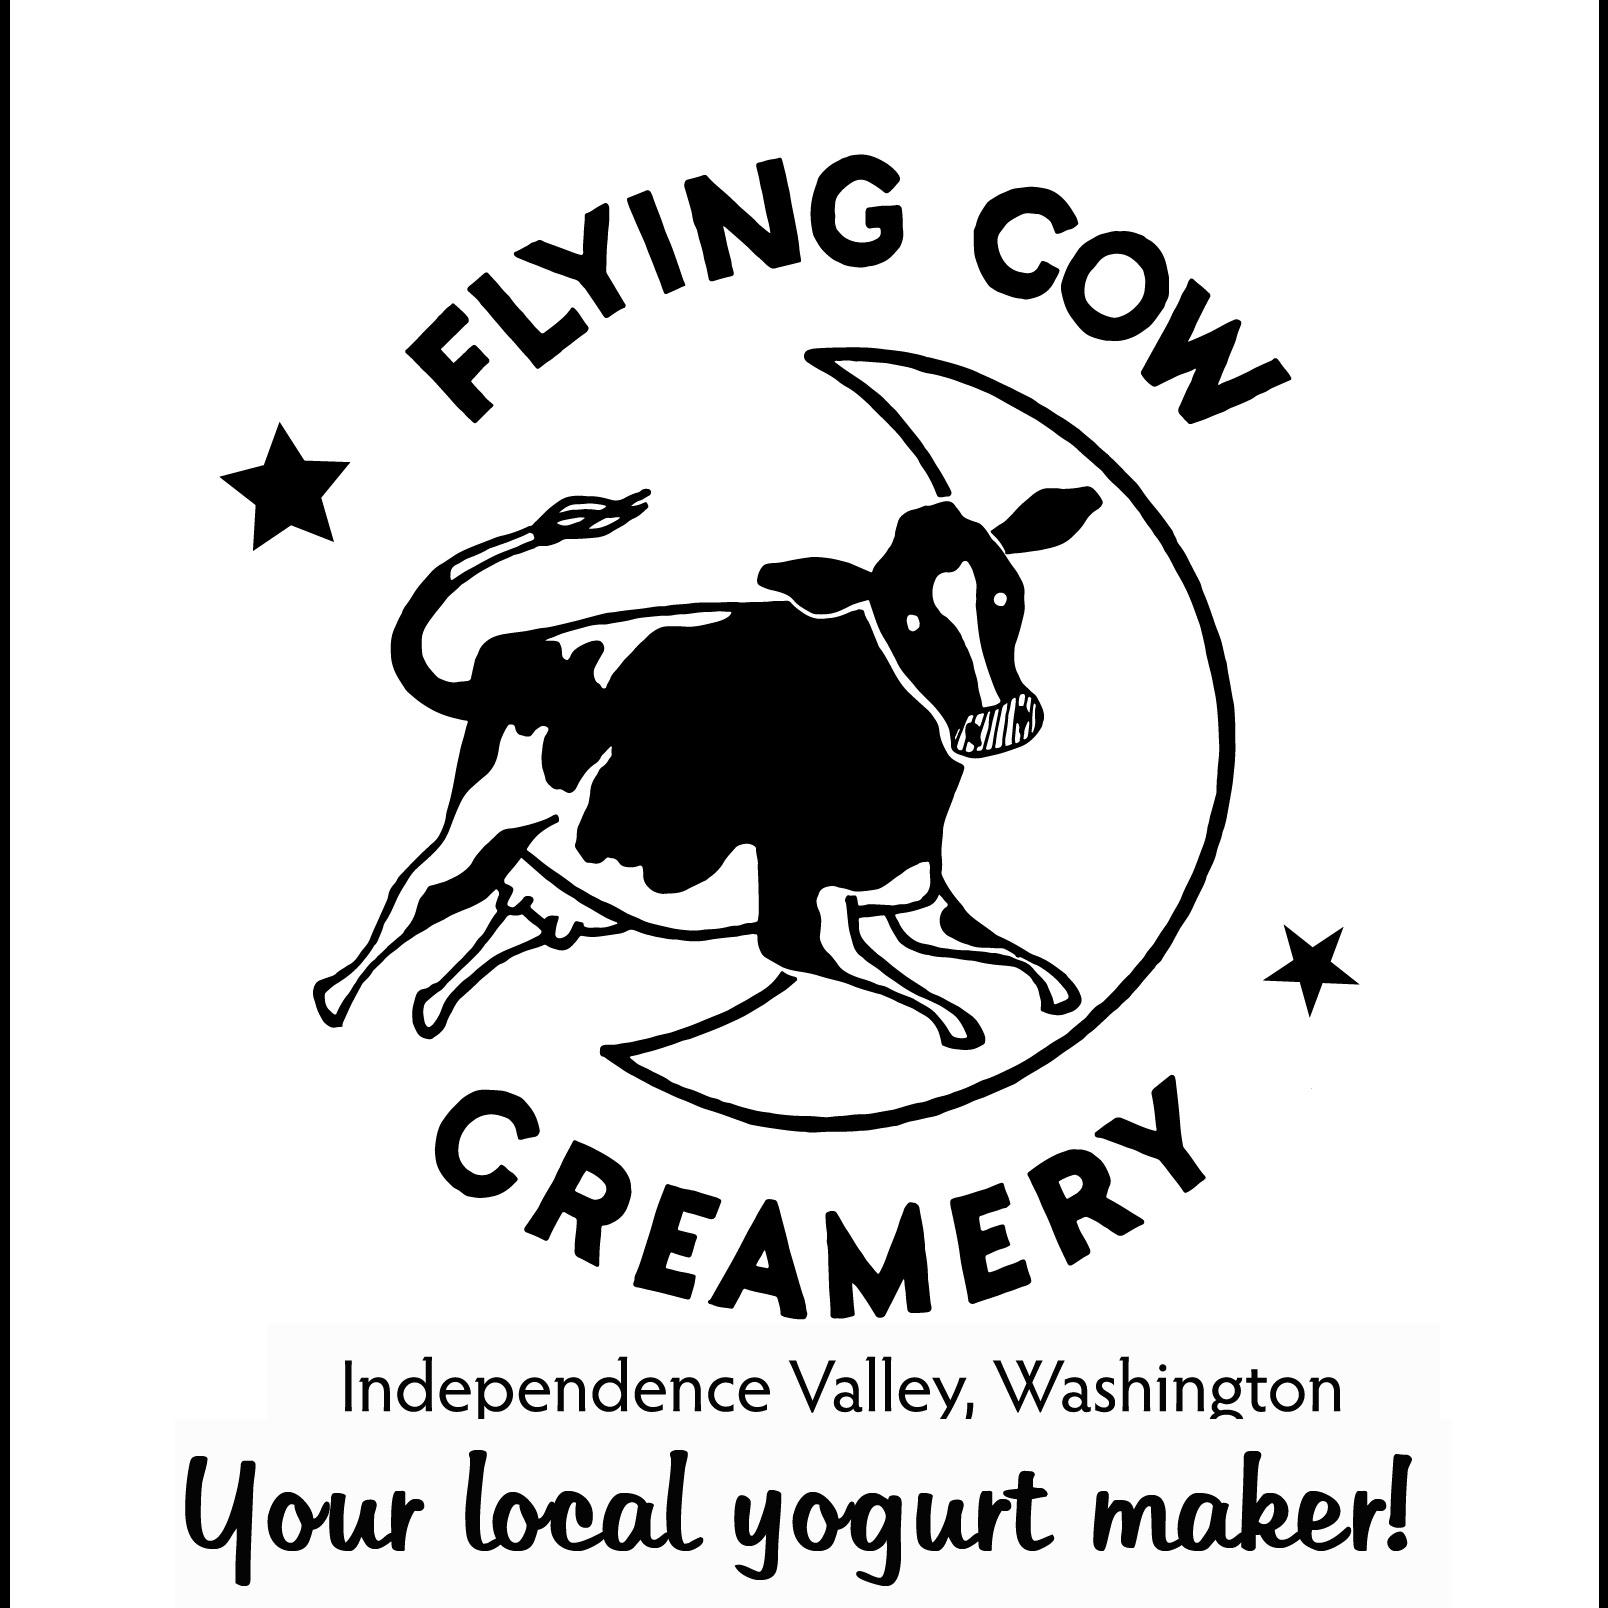 Flying Cow Creamery